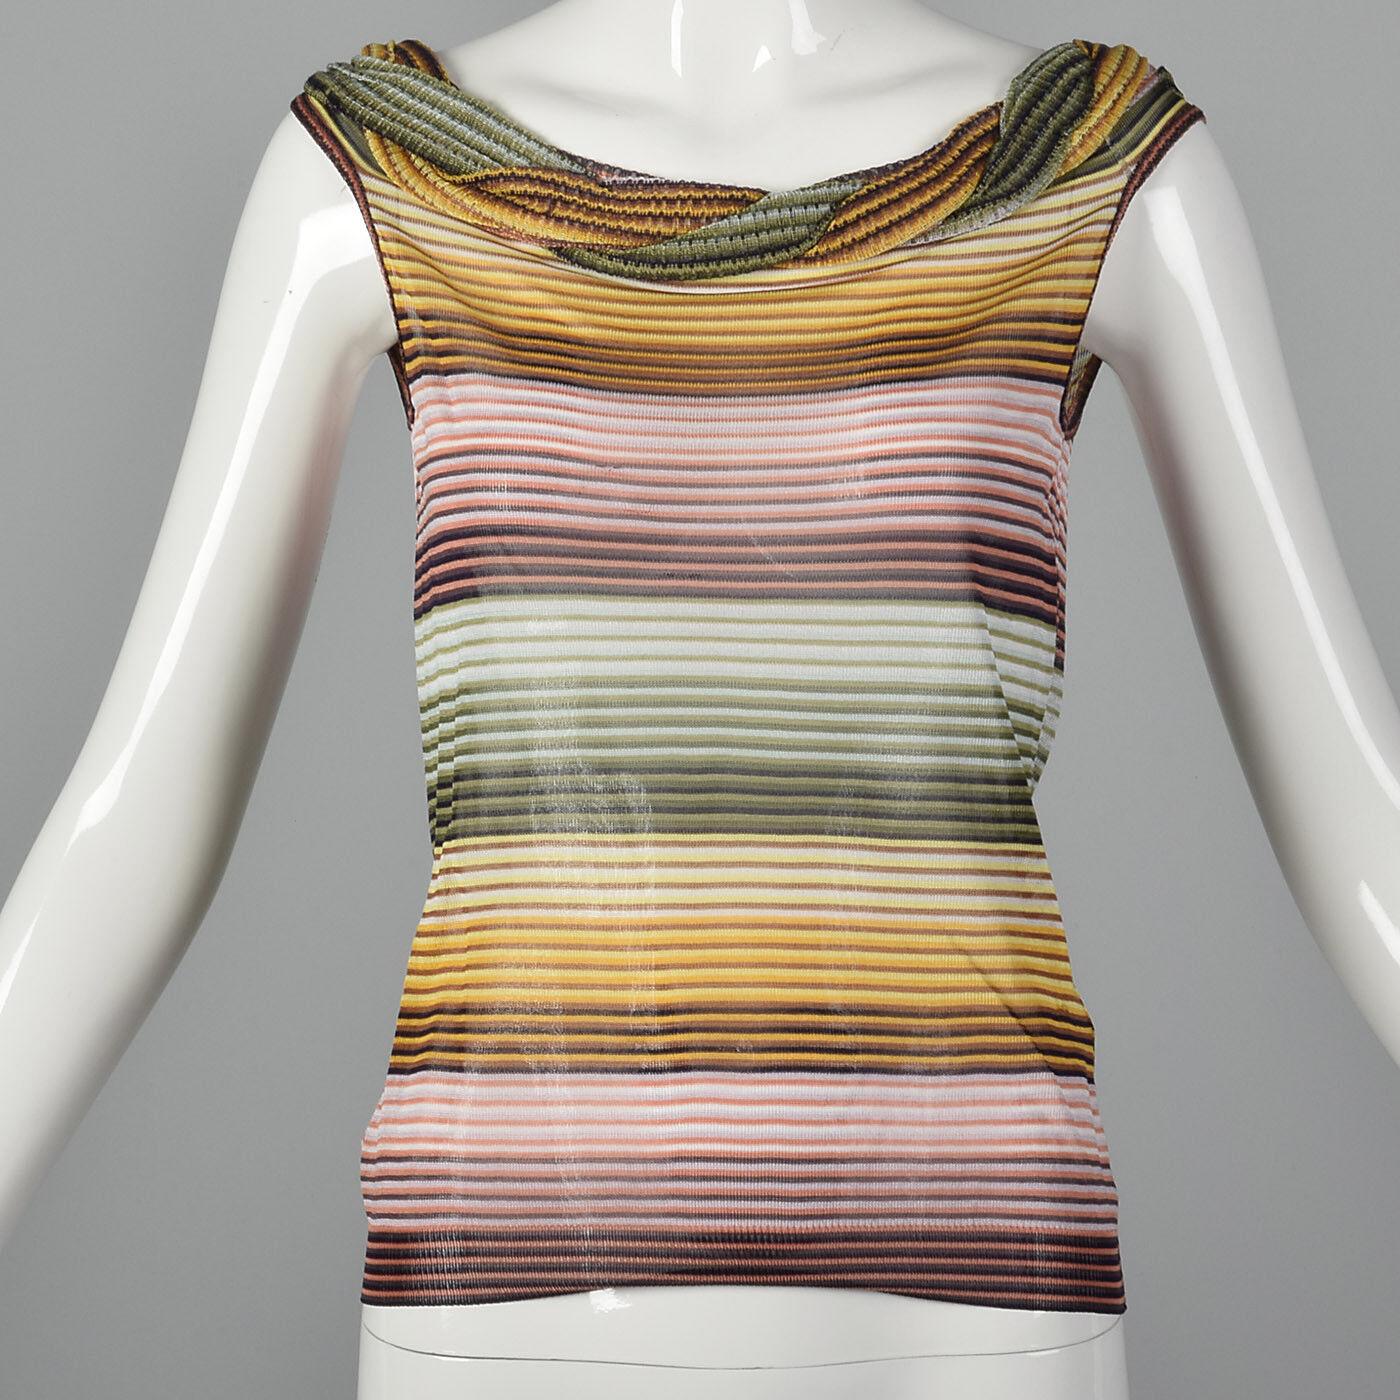 XS 1980s Missoni Knit Stripe Top Lightweight Sheer VTG Multi Farbe Stripes